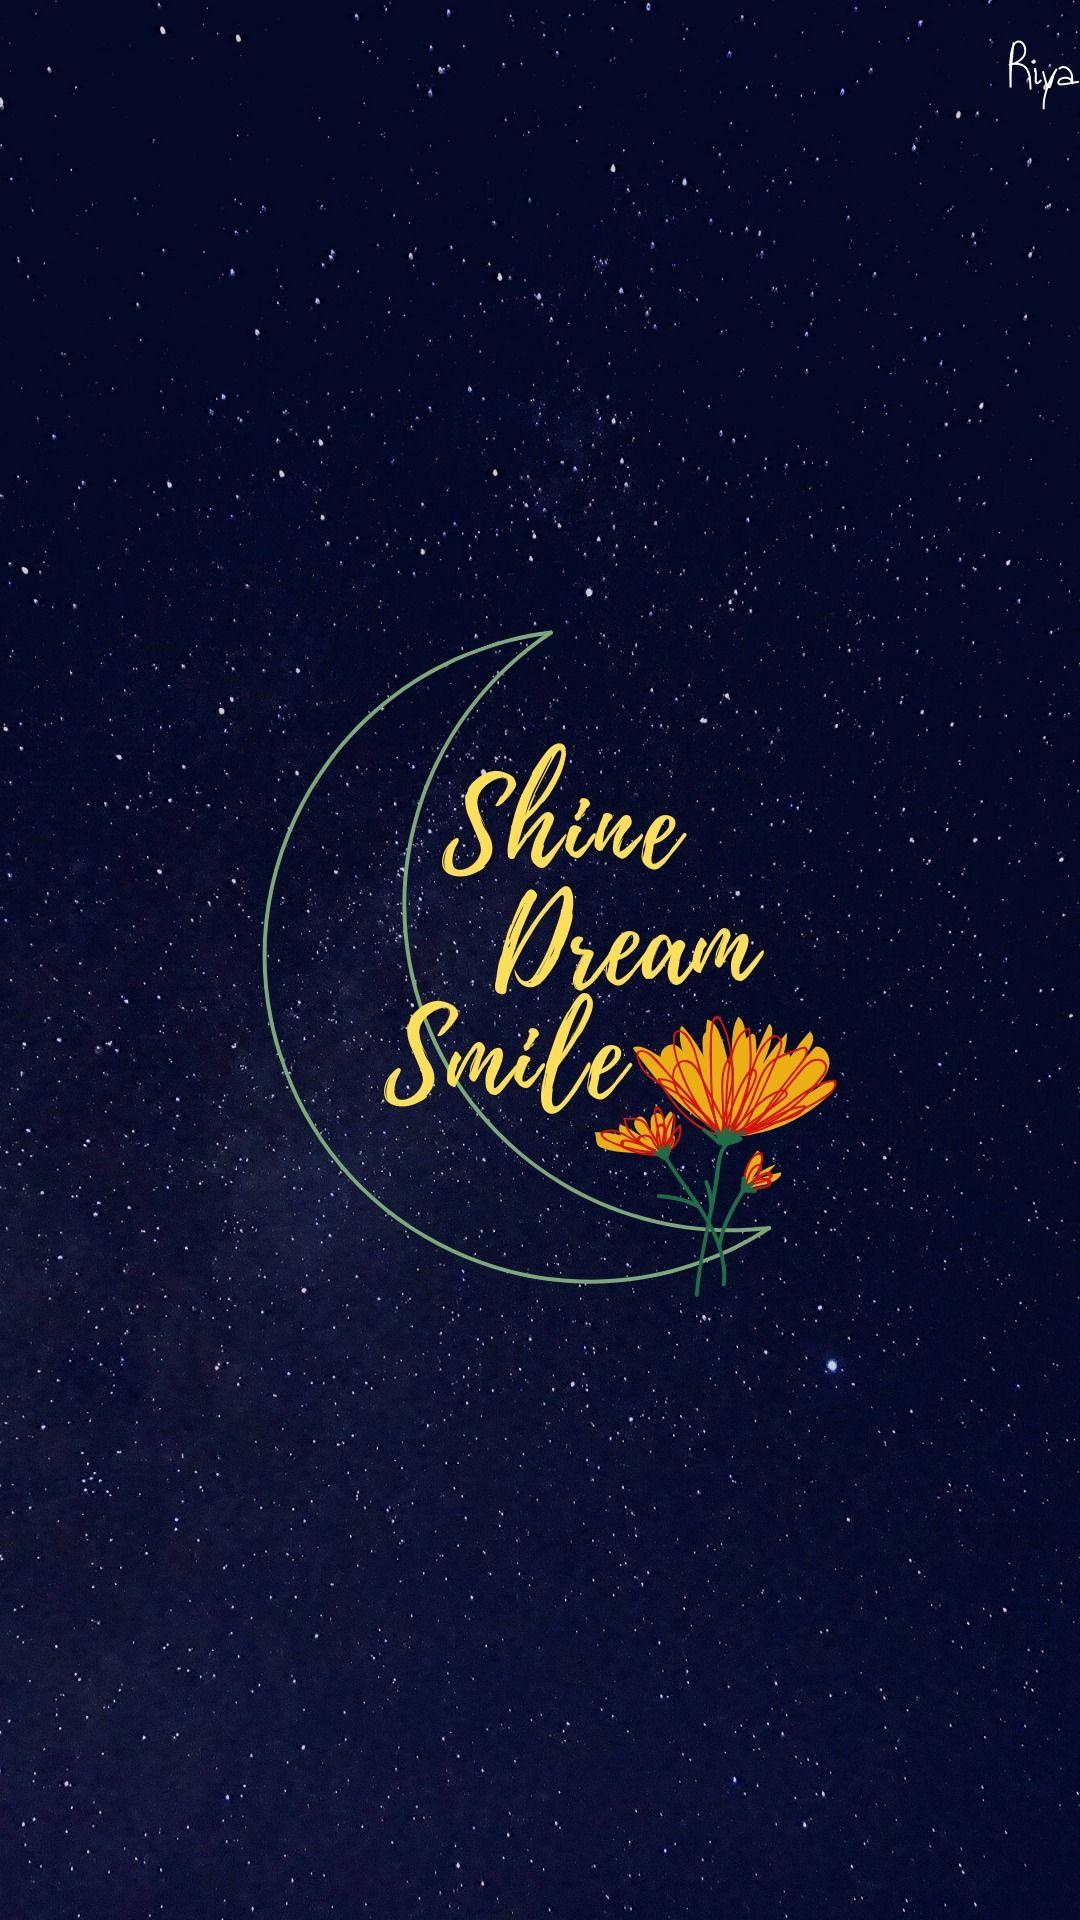 Shine Dream Smile Wallpaper Lockscreen Bts Wallpaper Lyrics Bts Wallpaper Bts Aesthetic Wallpaper For Phone Bts mikrokosmos wallpaper desktop